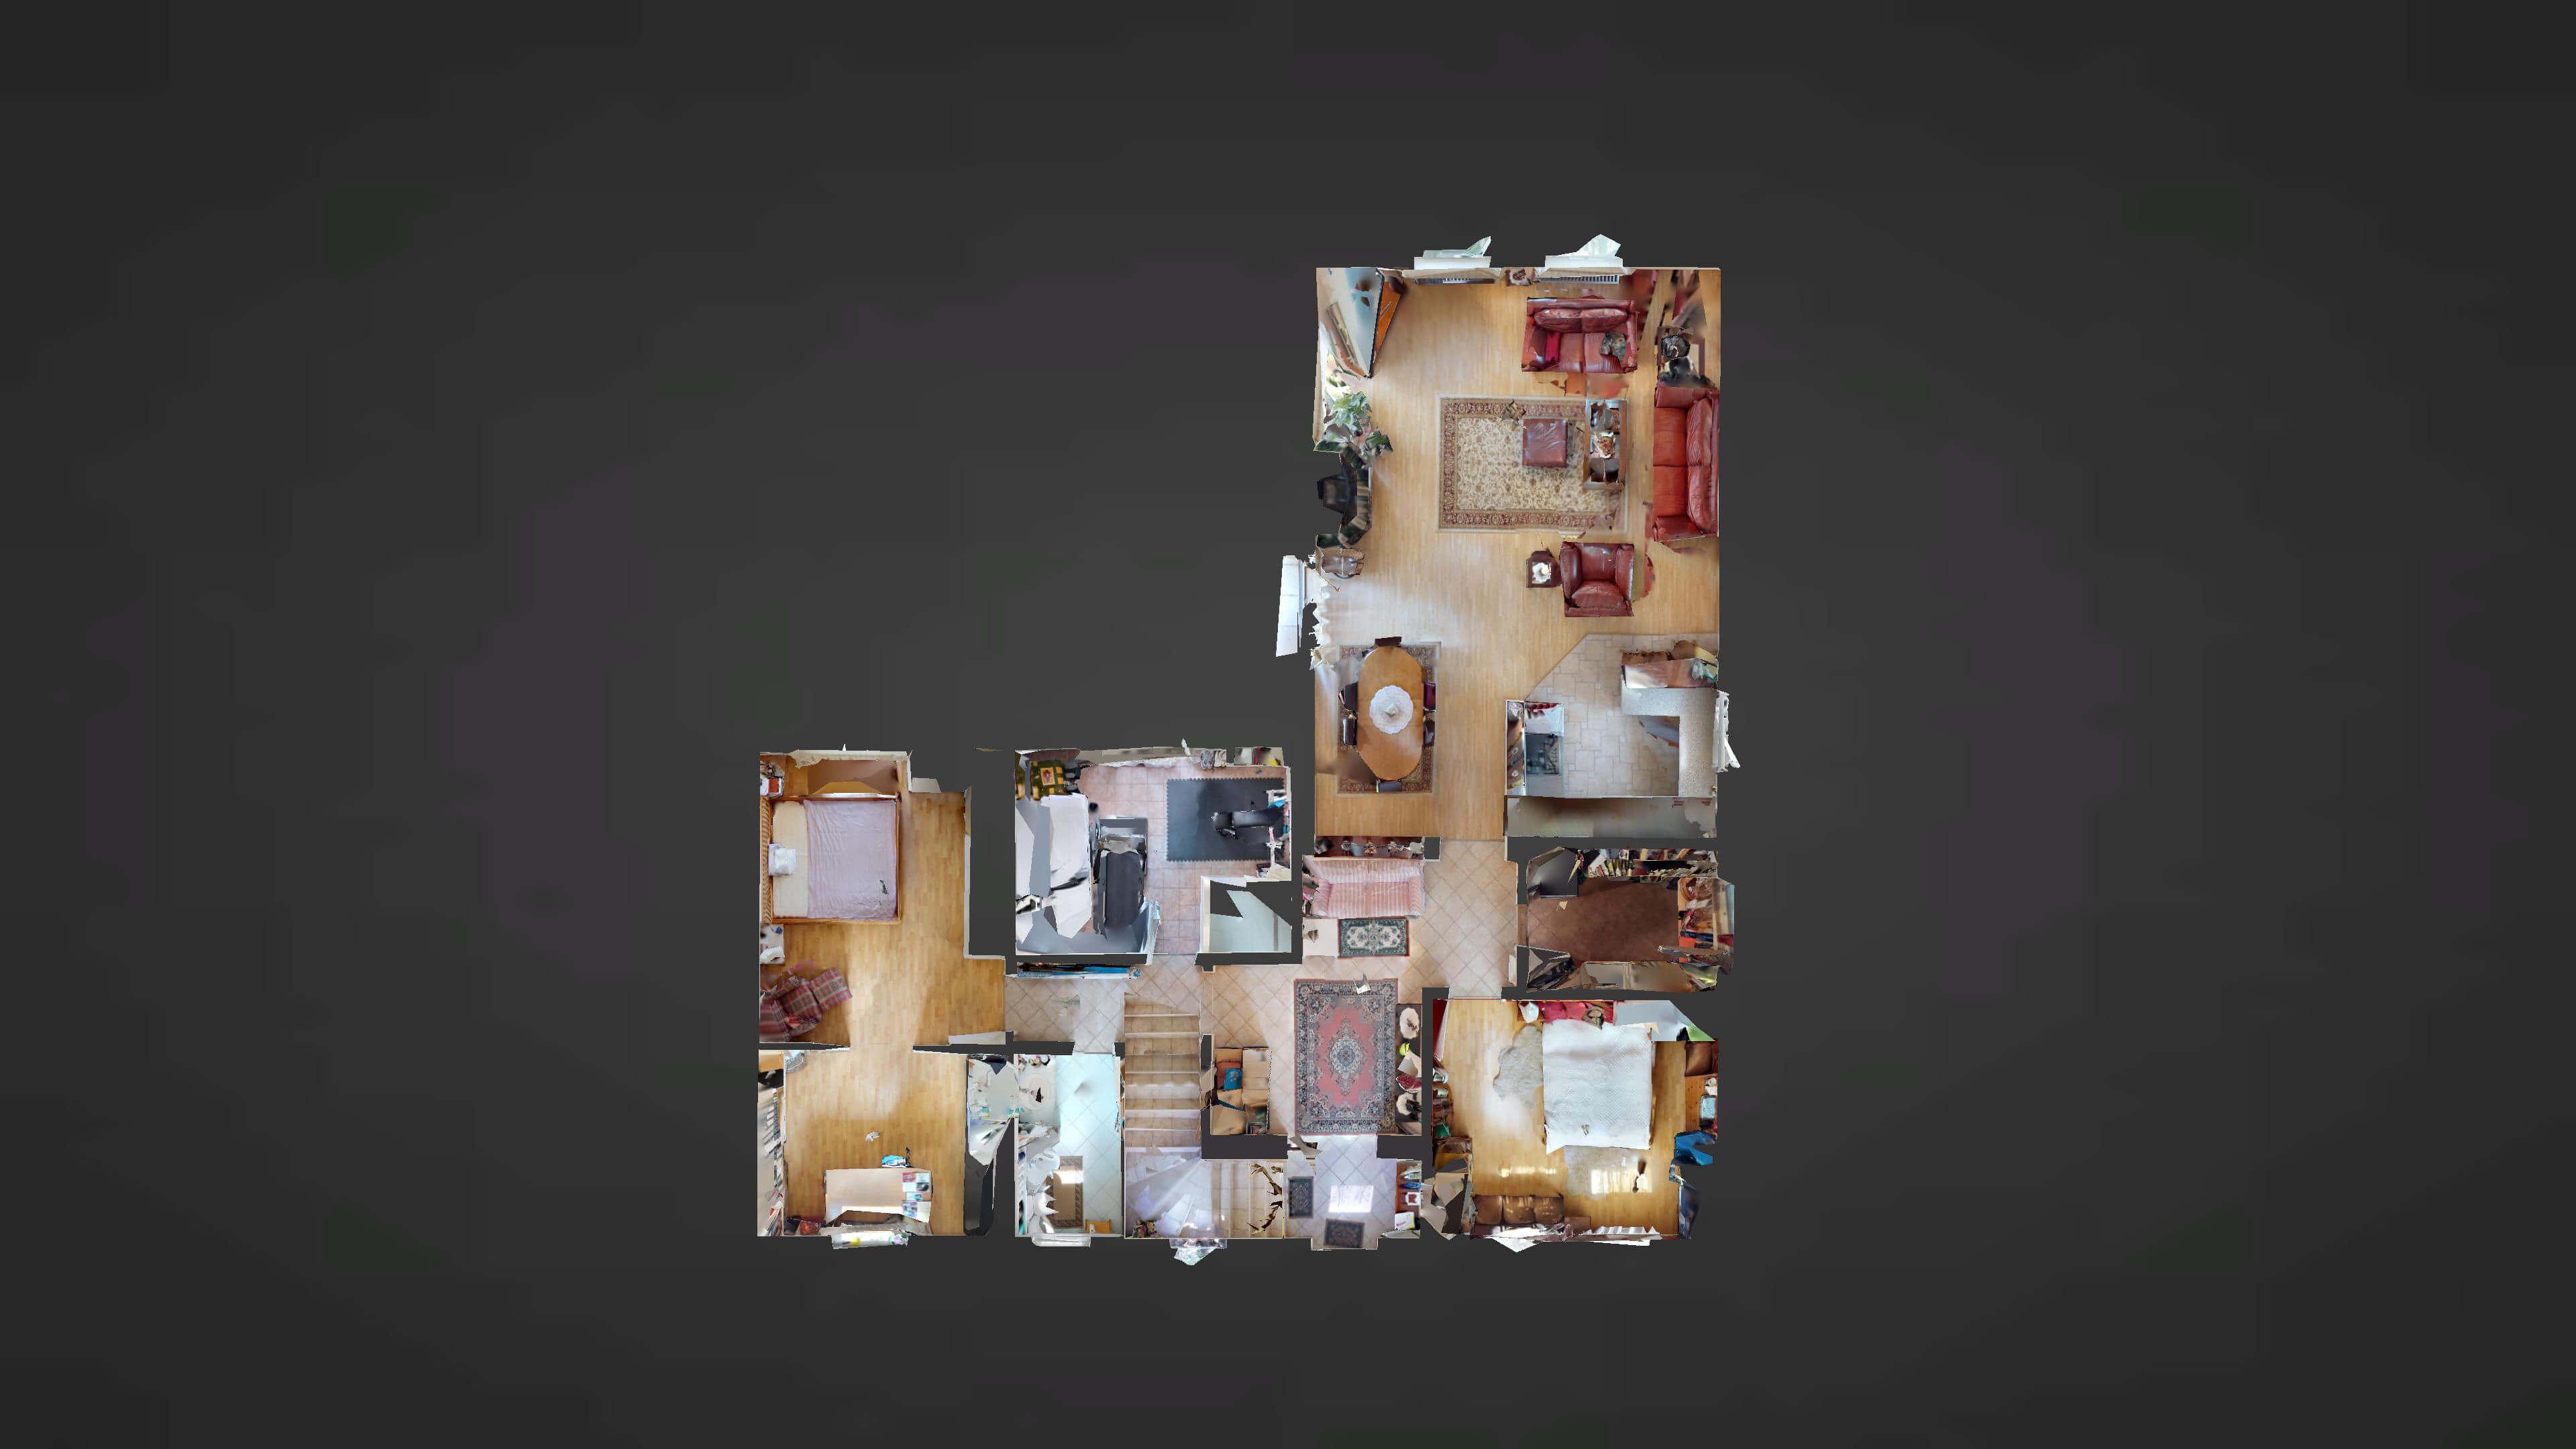 Rodinný dom na uzavretej ulici, Vojtechovce, 2 – generačný 6 izbový, úžitková 270m2, pozemok 600m2, garáž-17